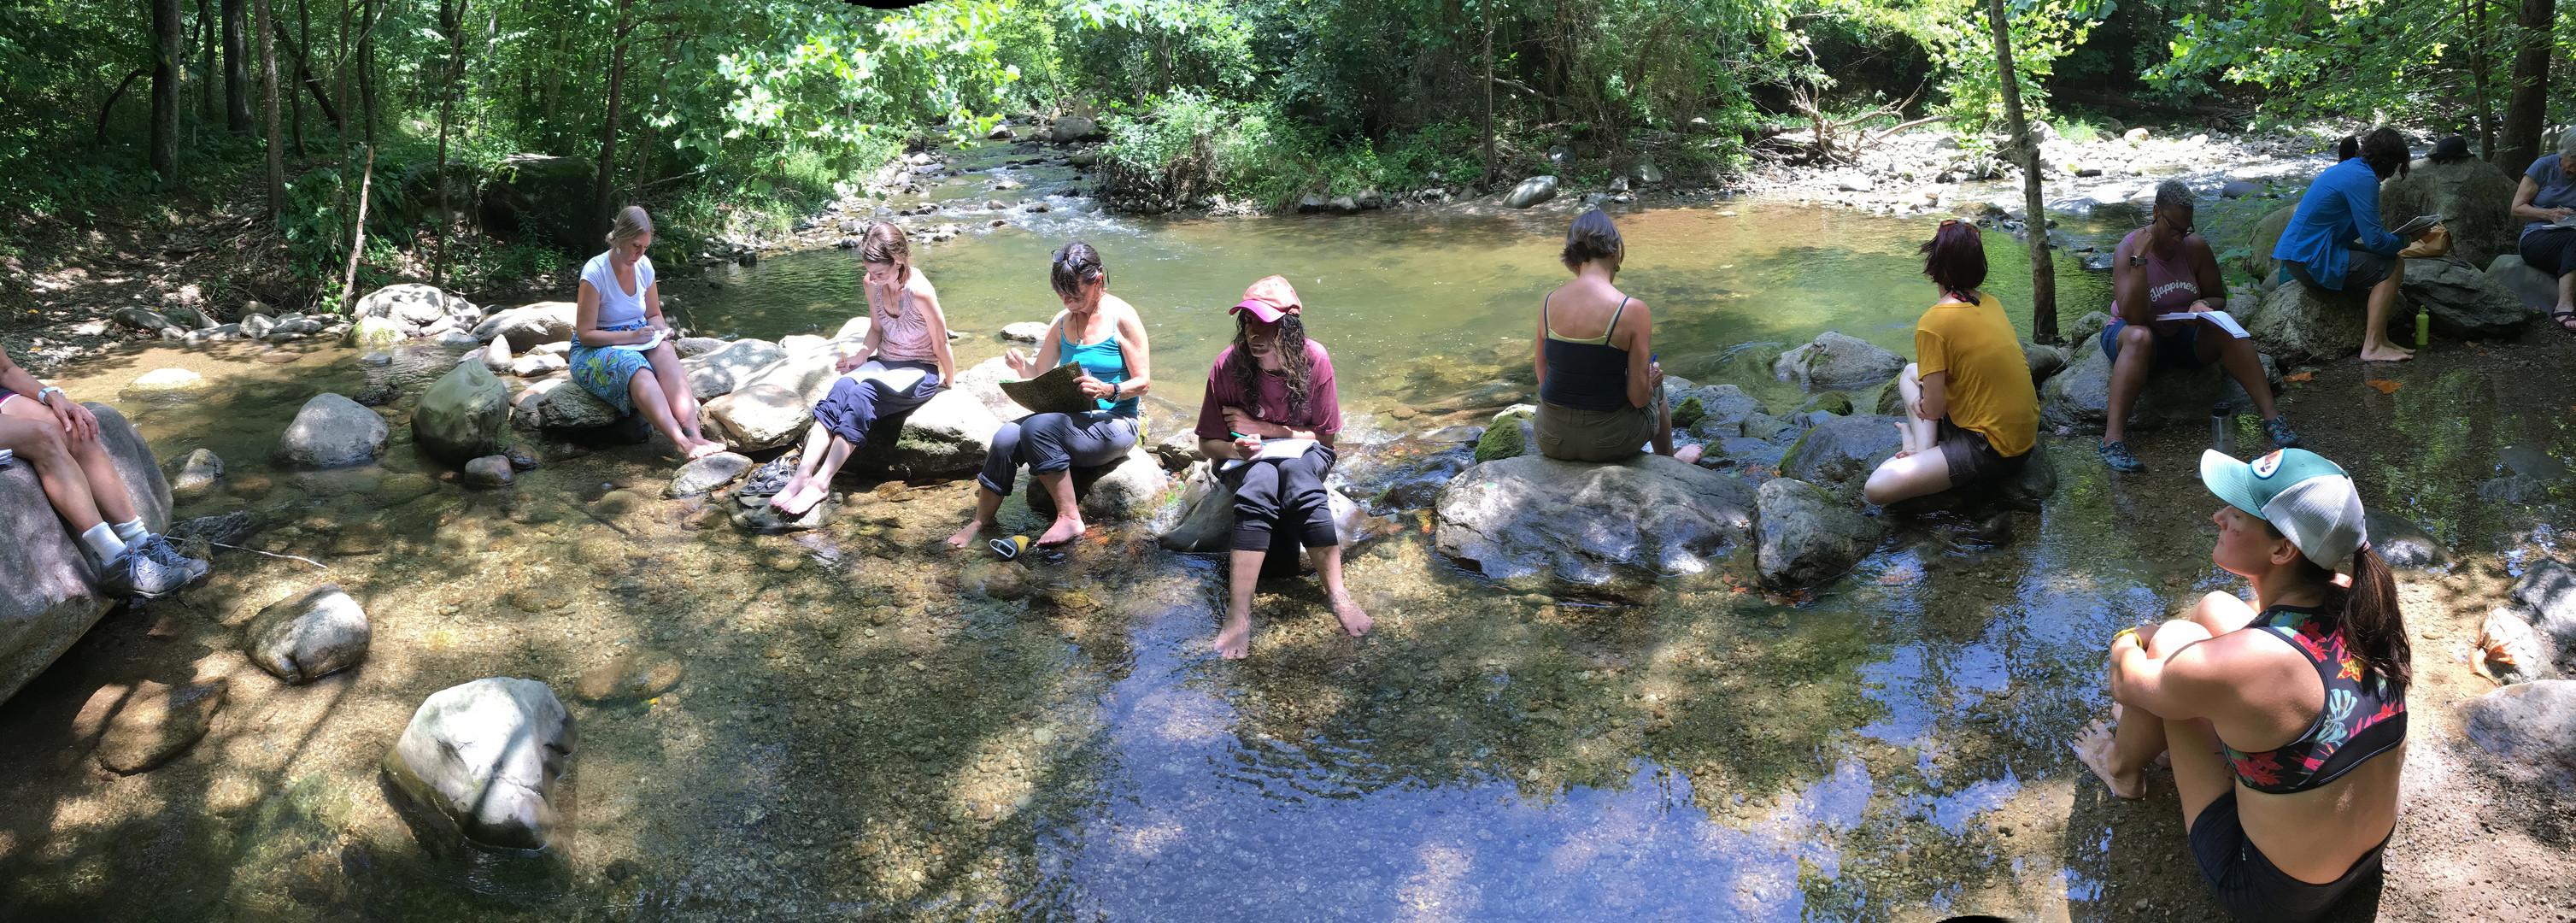 Eco-journaling